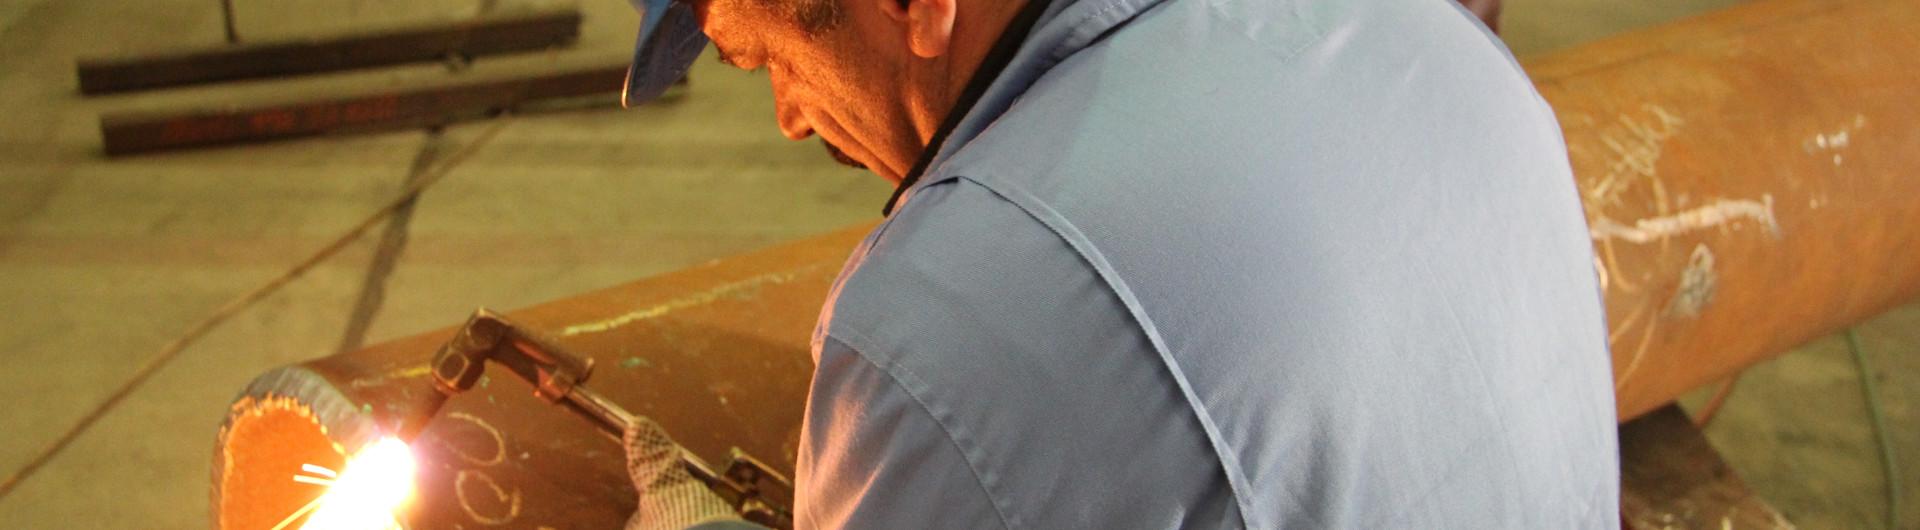 Manual thermal cutting, pitfalls to avoid